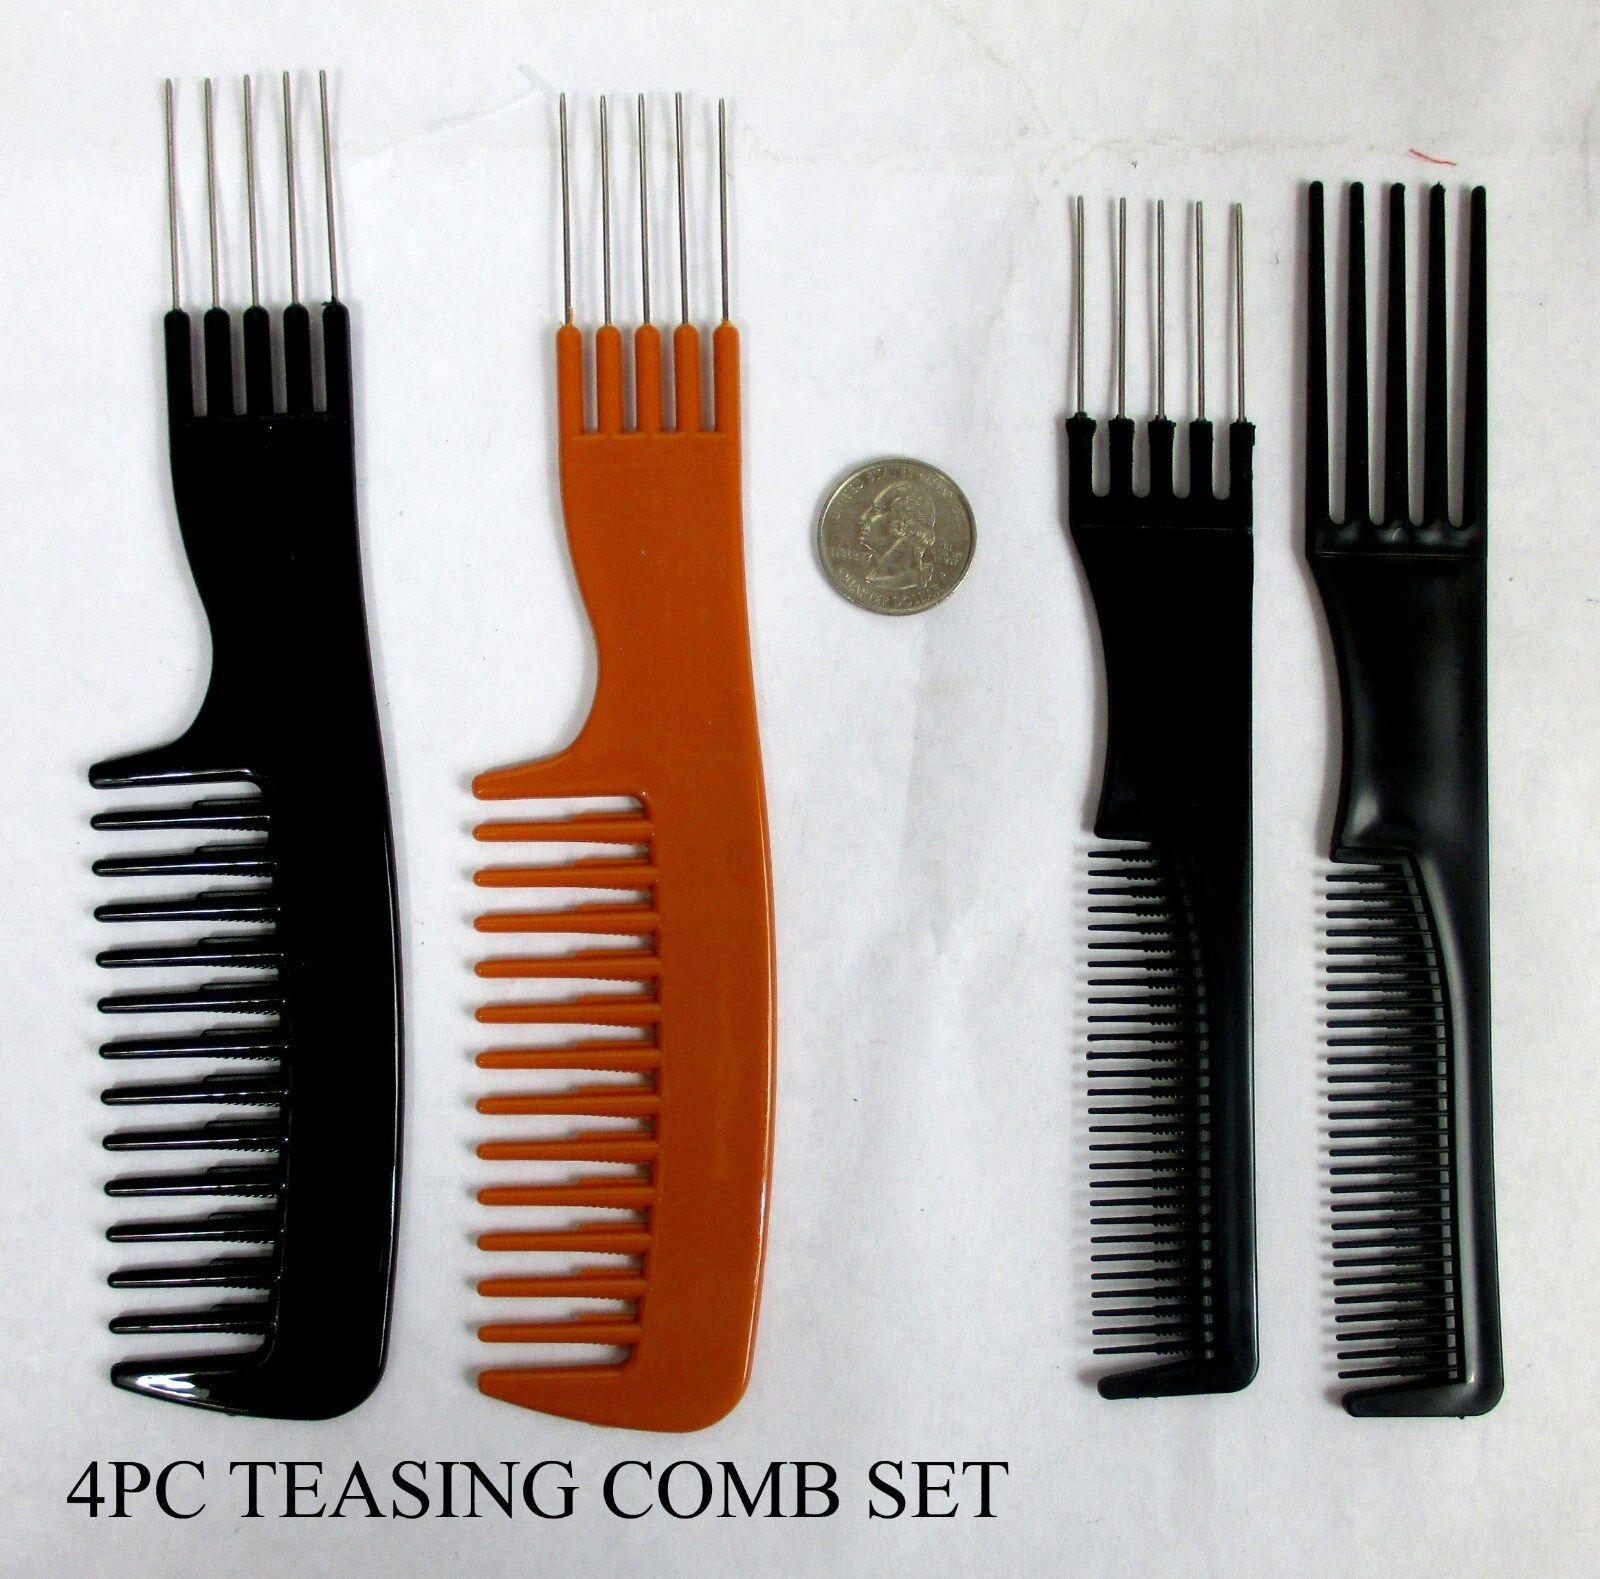 1 2 4 pc teasing hair styling